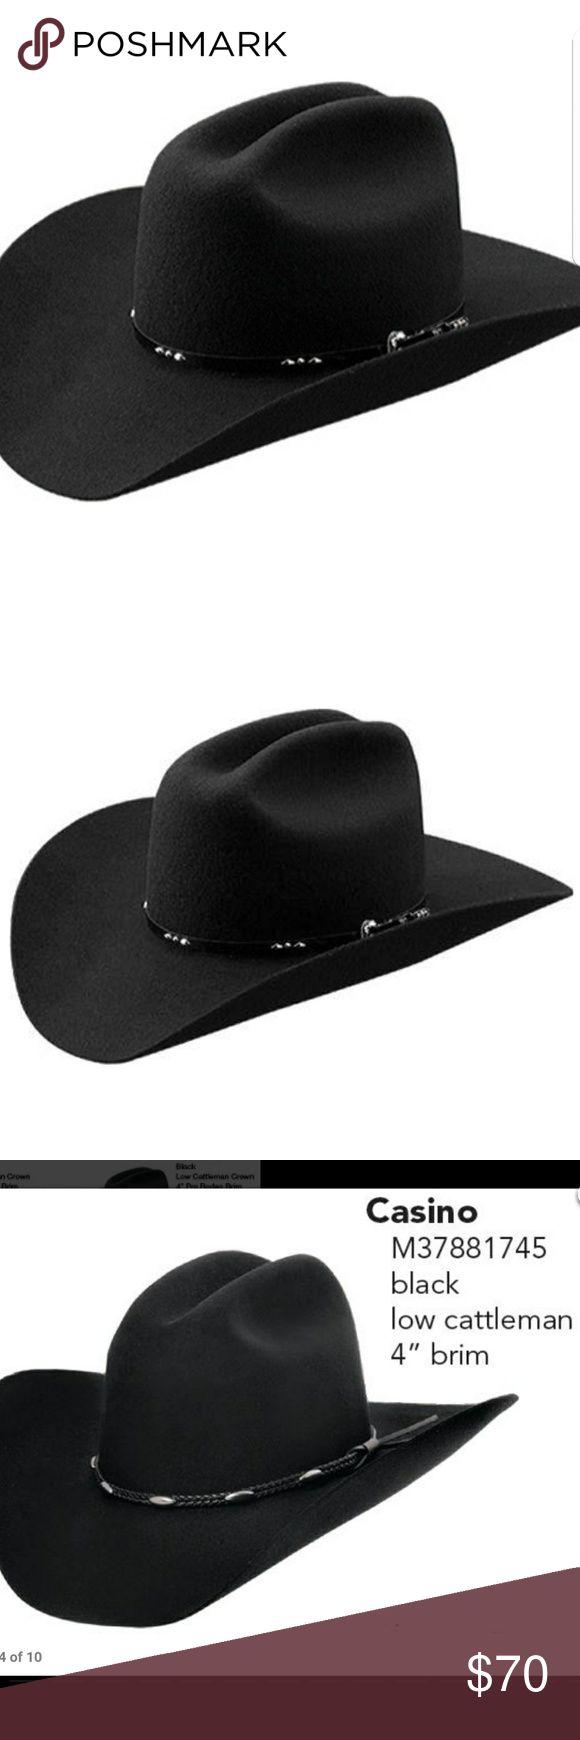 casino cowboy hat